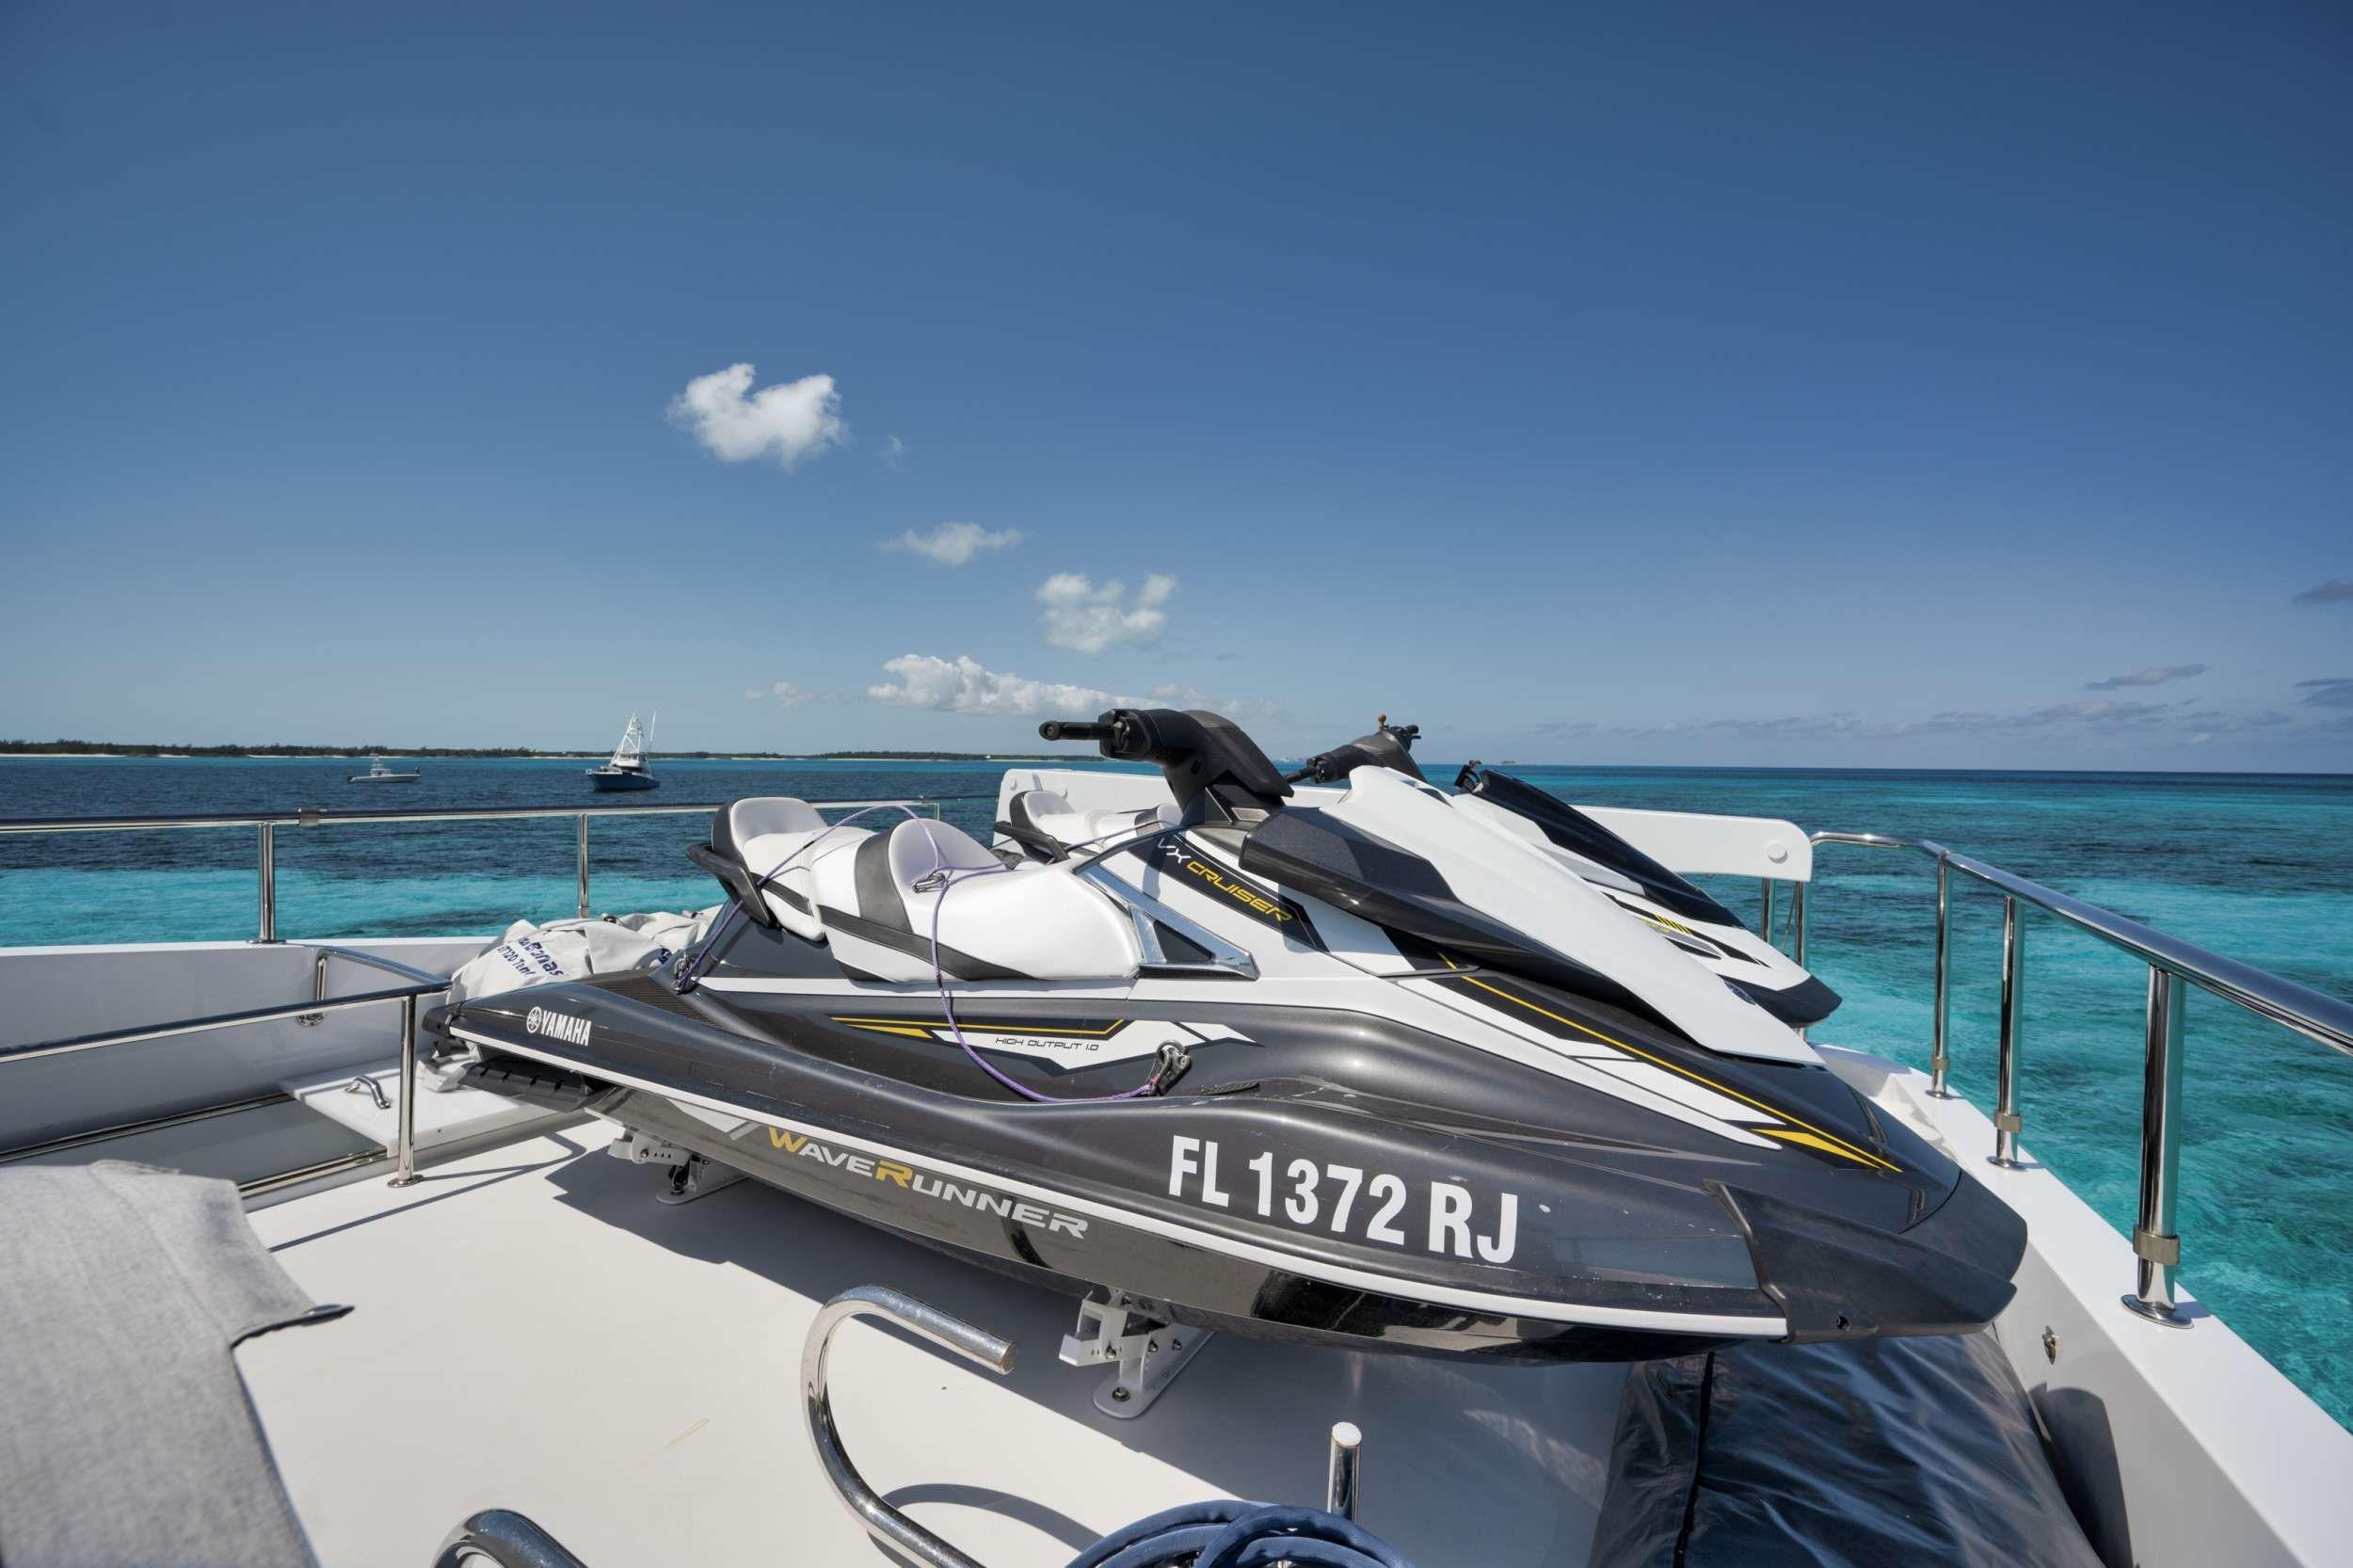 LIMITLESS Crewed Motor Yacht Jet Ski